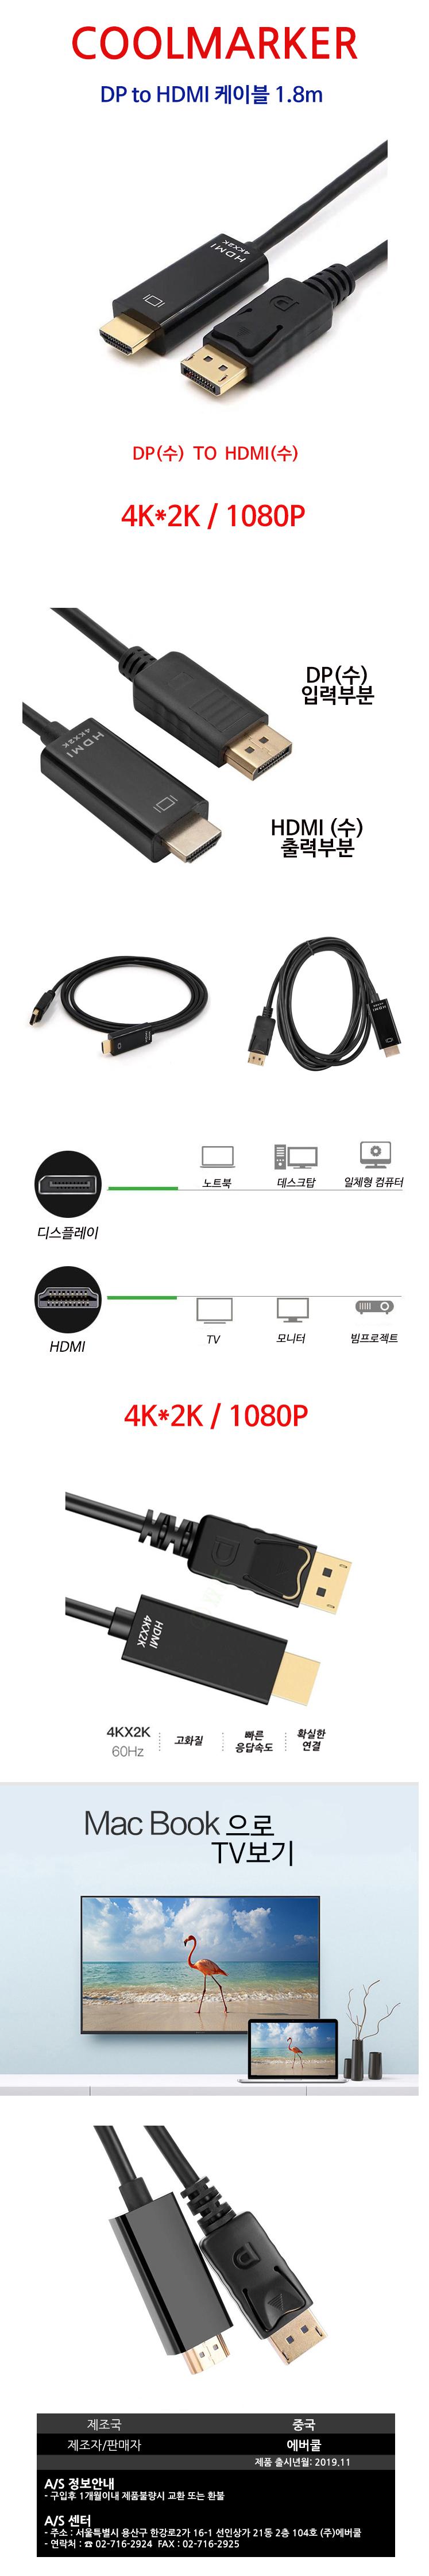 EVERCOOL COOLMARKER DisplayPort to HDMI 변환 케이블 (1.8m)